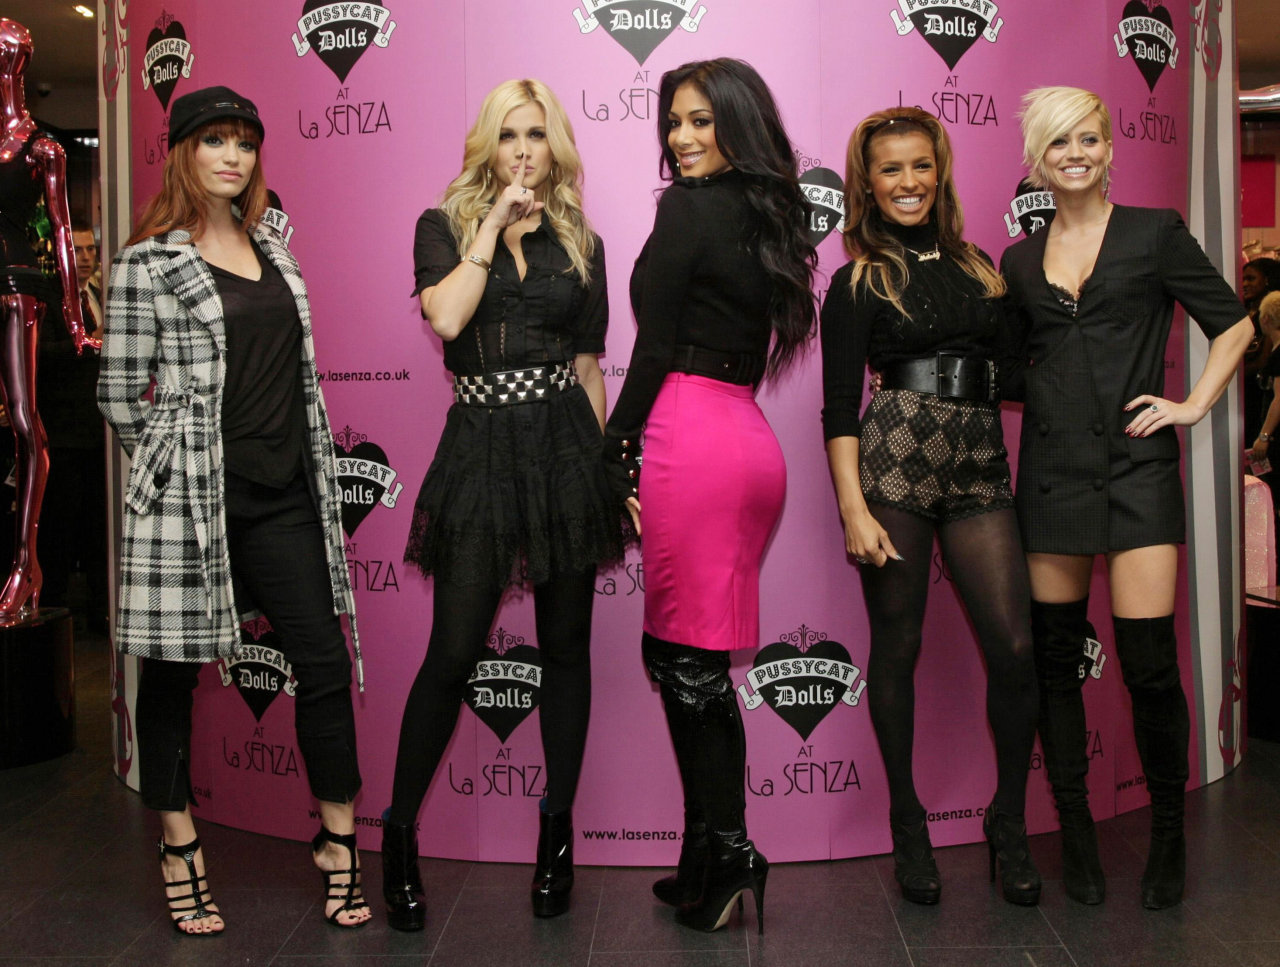 Celebrity Pussycat Dolls Photos Pictures wallpapers Pussycat Dolls 1280x967